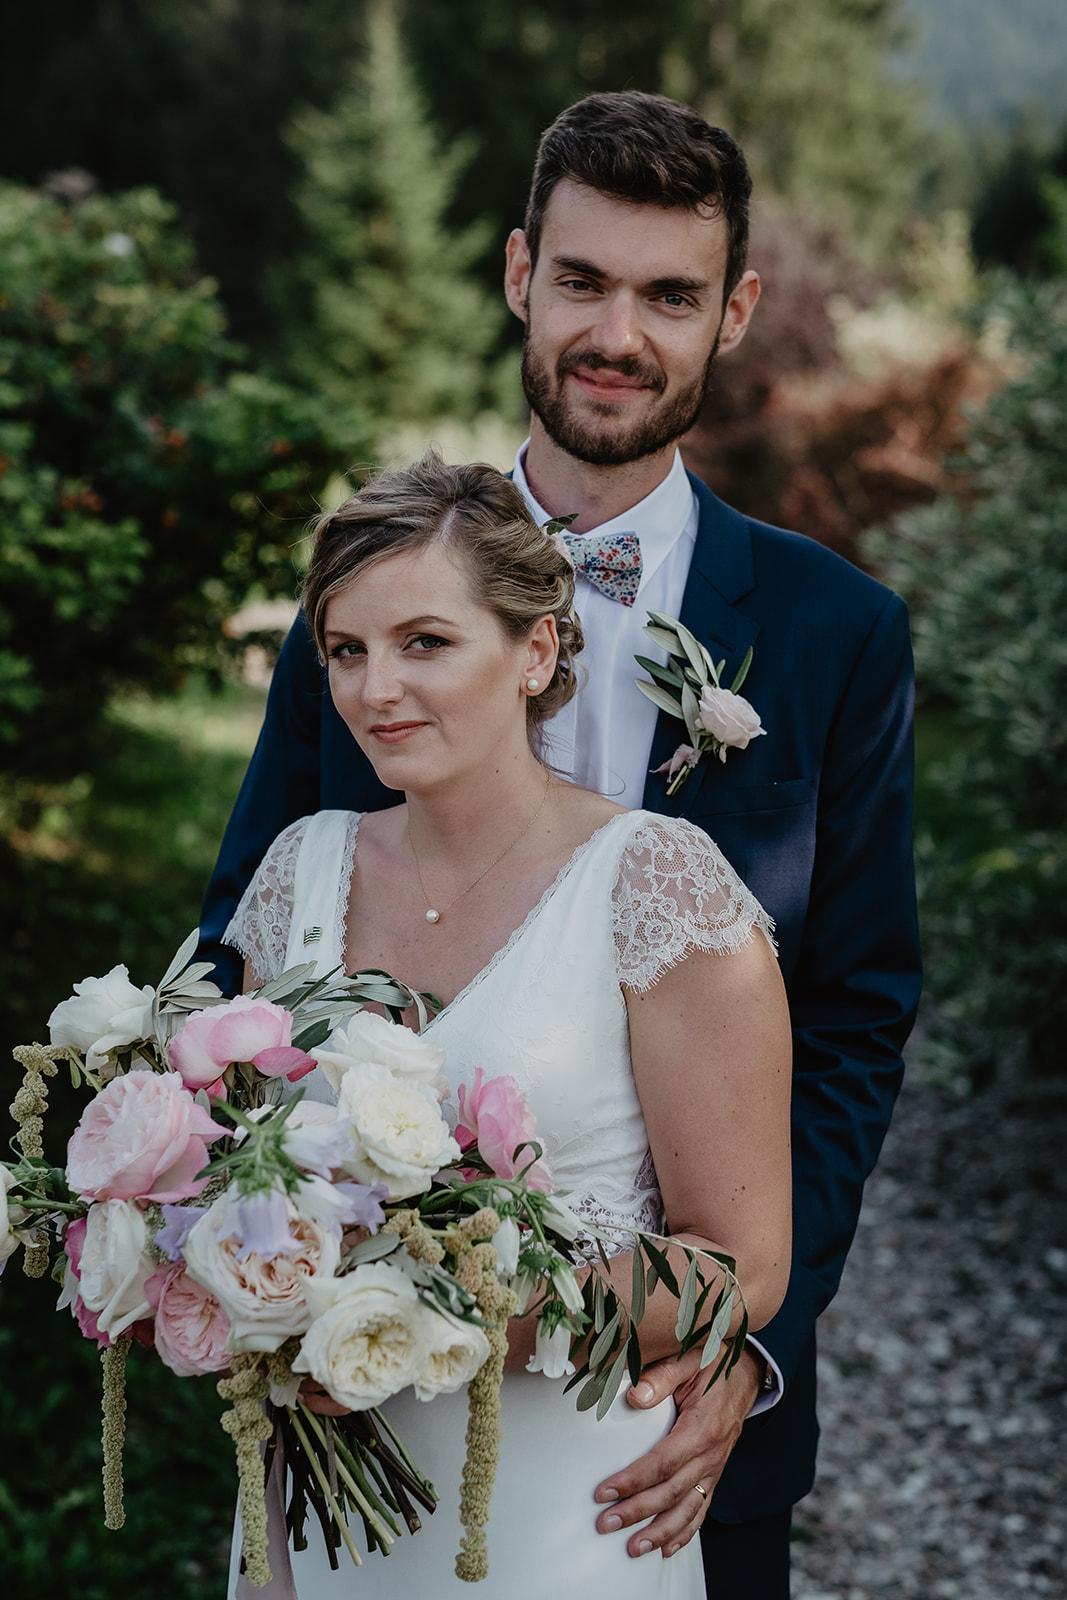 charlineflorian 190 websize - Sweet Love & Confettis - Wedding planner - Organisation de Mariage en France, au Luxembourg, en italie, en provence, à la montagne